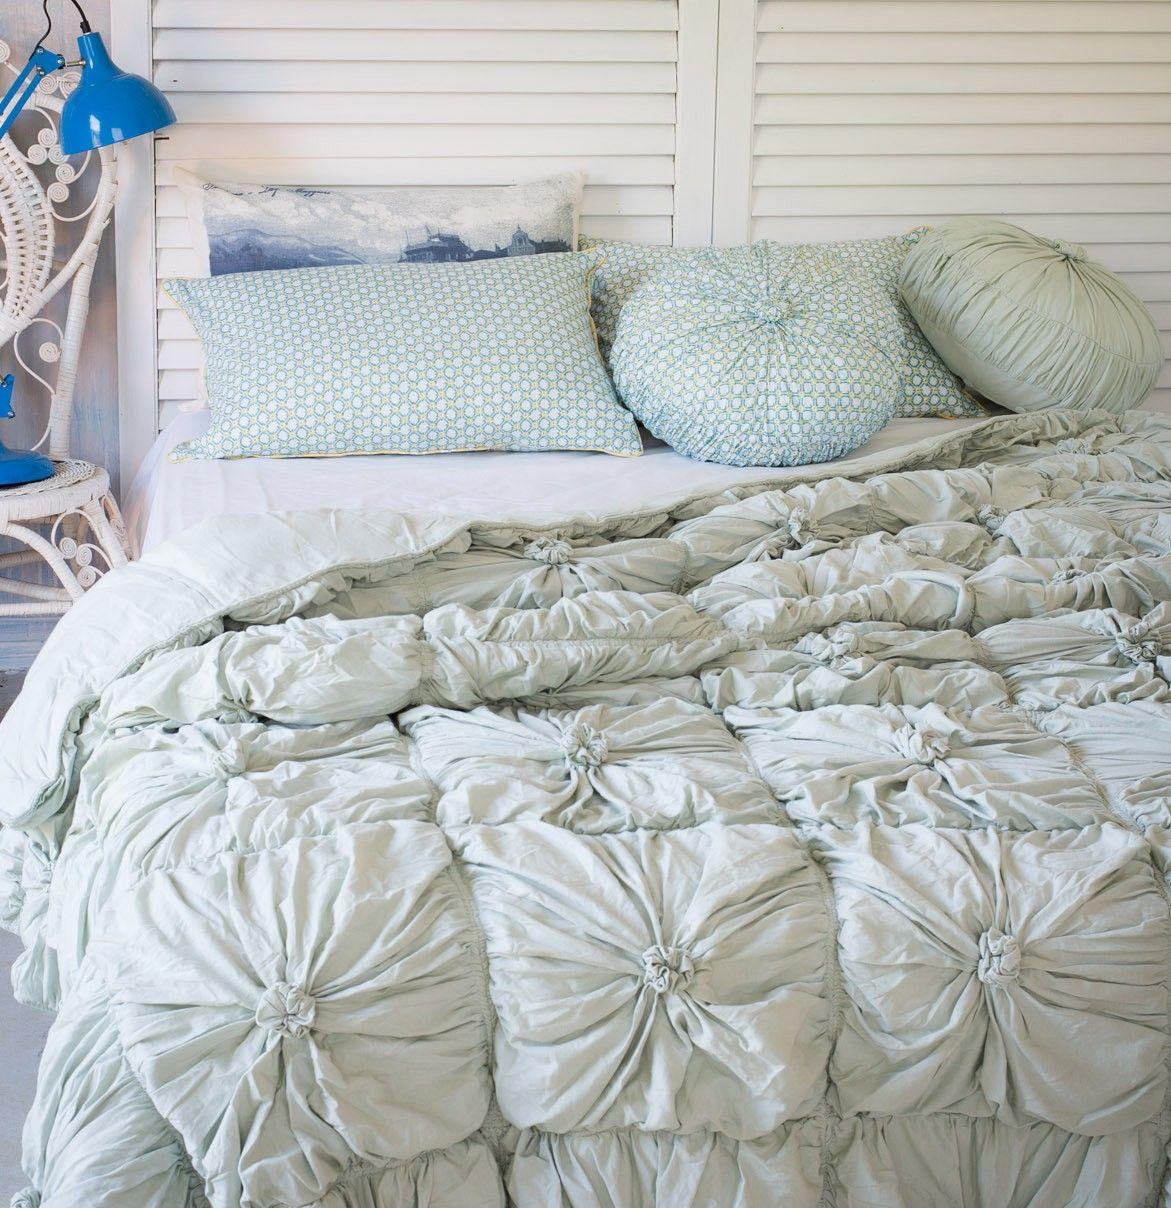 Rosette bedding, duck egg blue from Lazybones | Bedroom ... : rosette quilt - Adamdwight.com